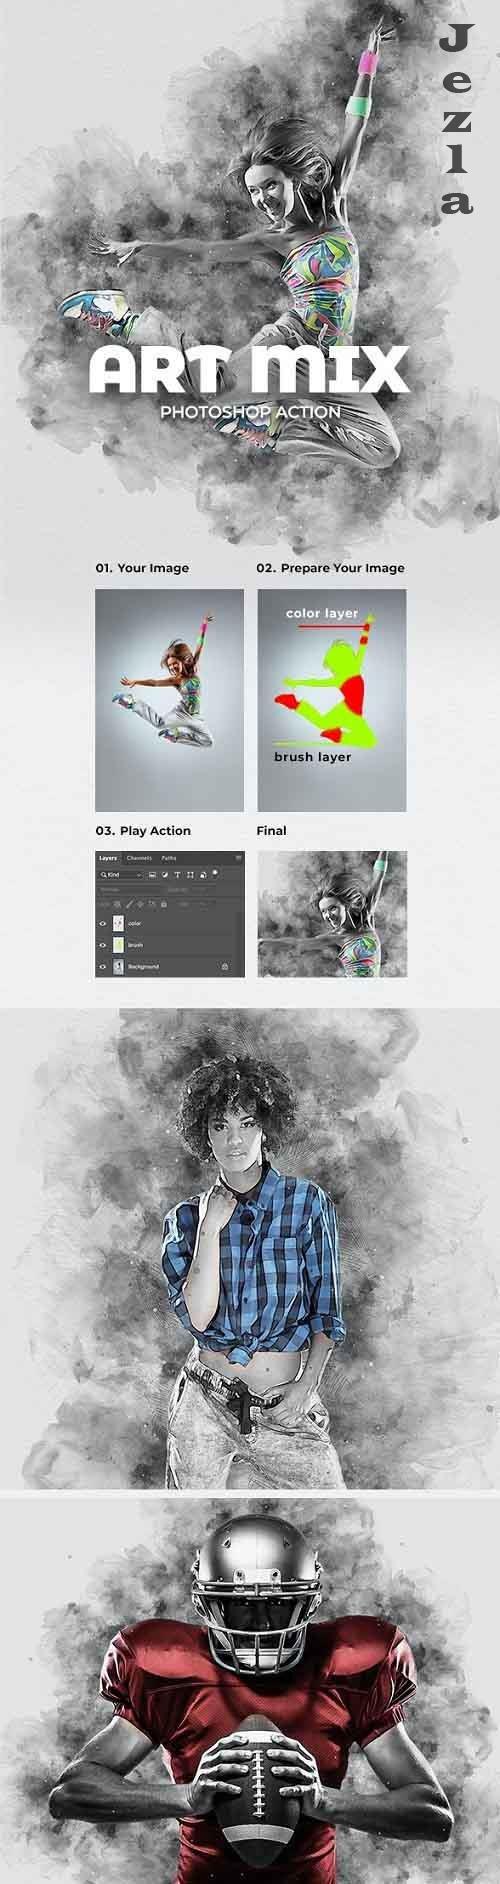 Art Mix Photoshop Action 28178955